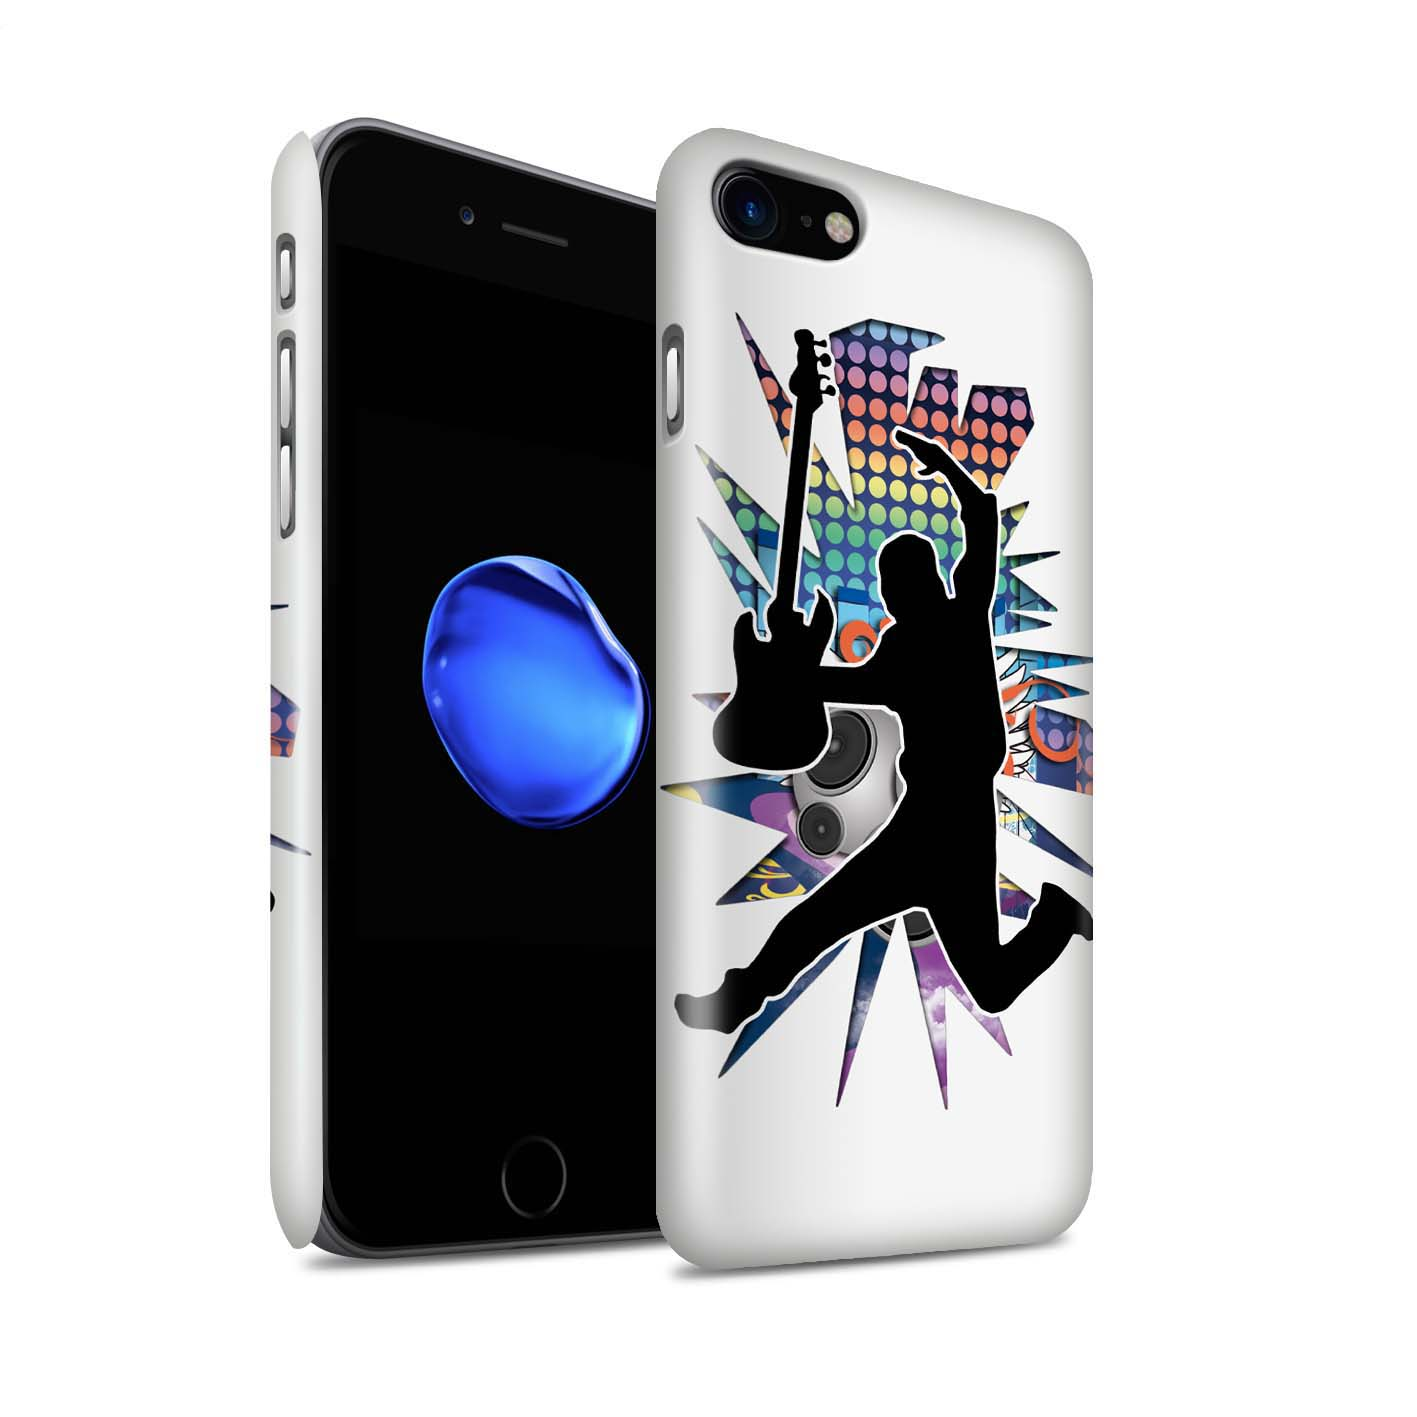 Coque-Etui-Brillant-de-STUFF4-pour-Apple-iPhone-7-Rock-Star-Pose